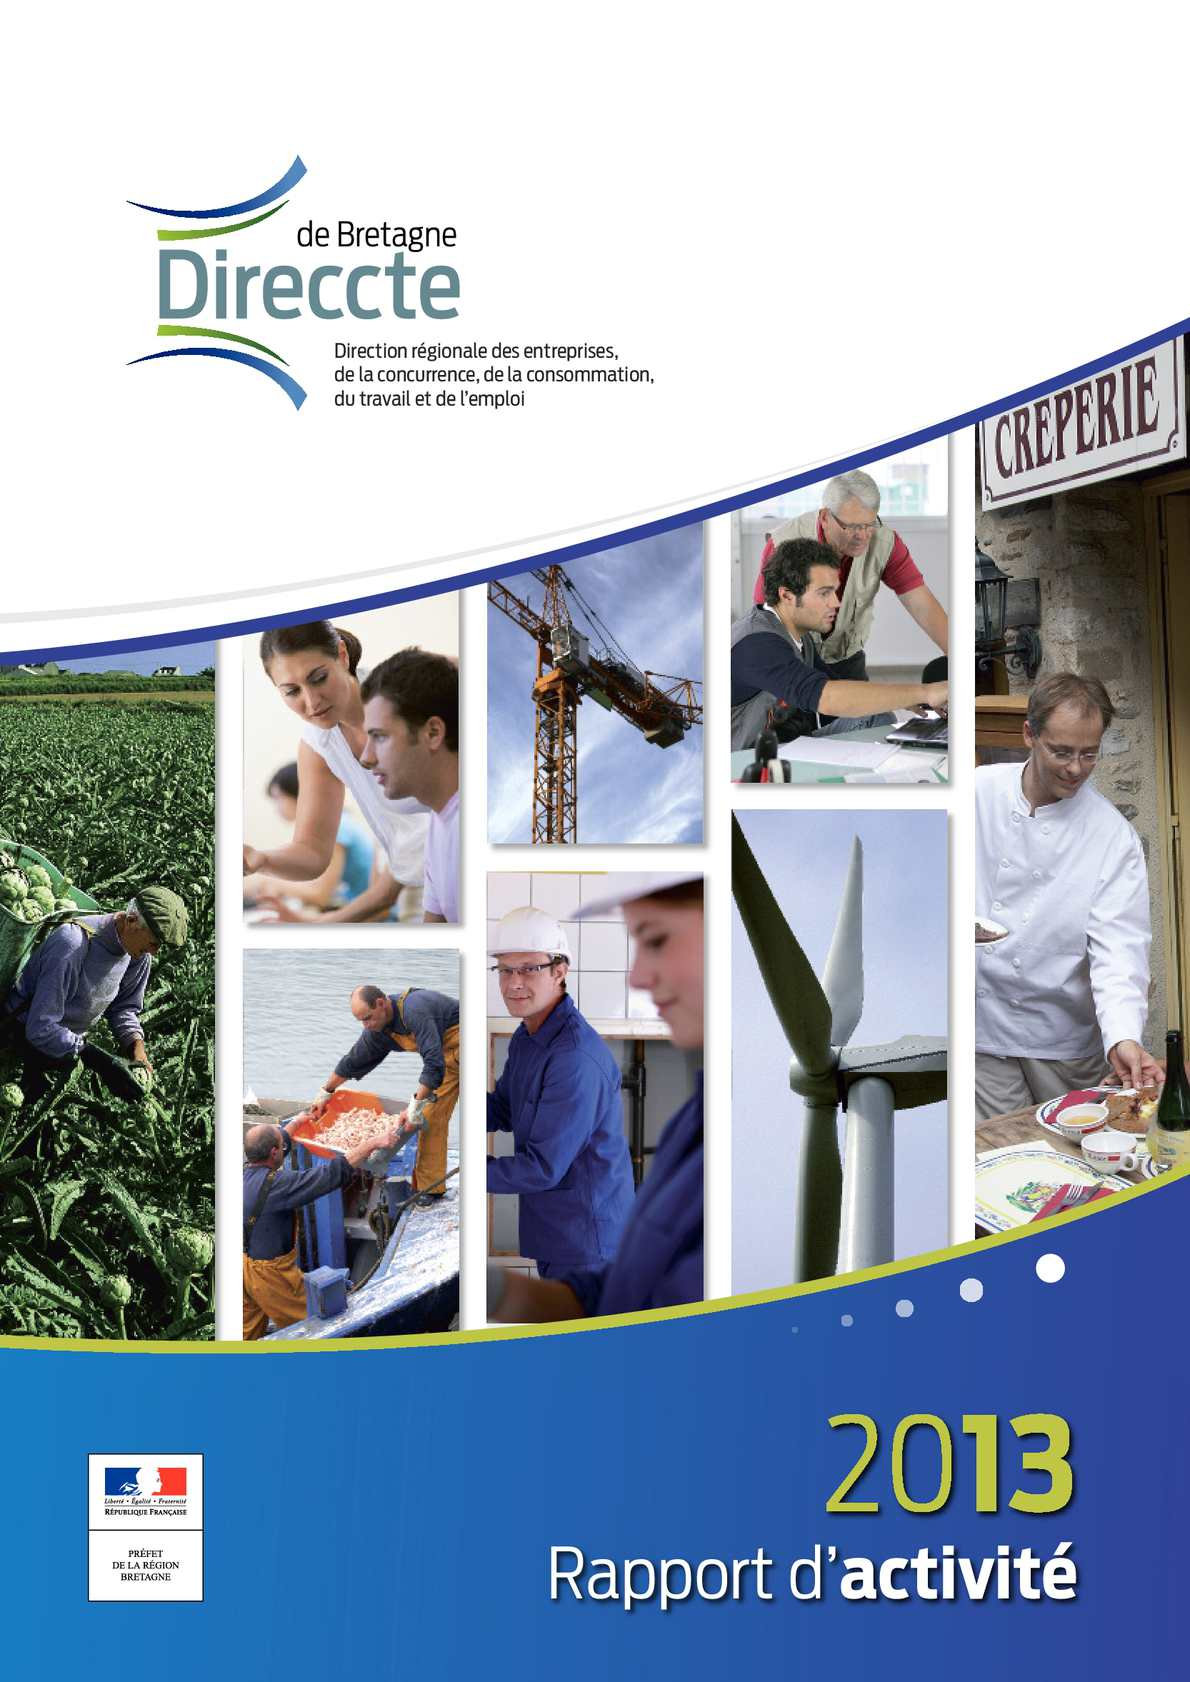 91d50f8989a Calaméo - Rapport d activité 2013 - Direccte de Bretagne